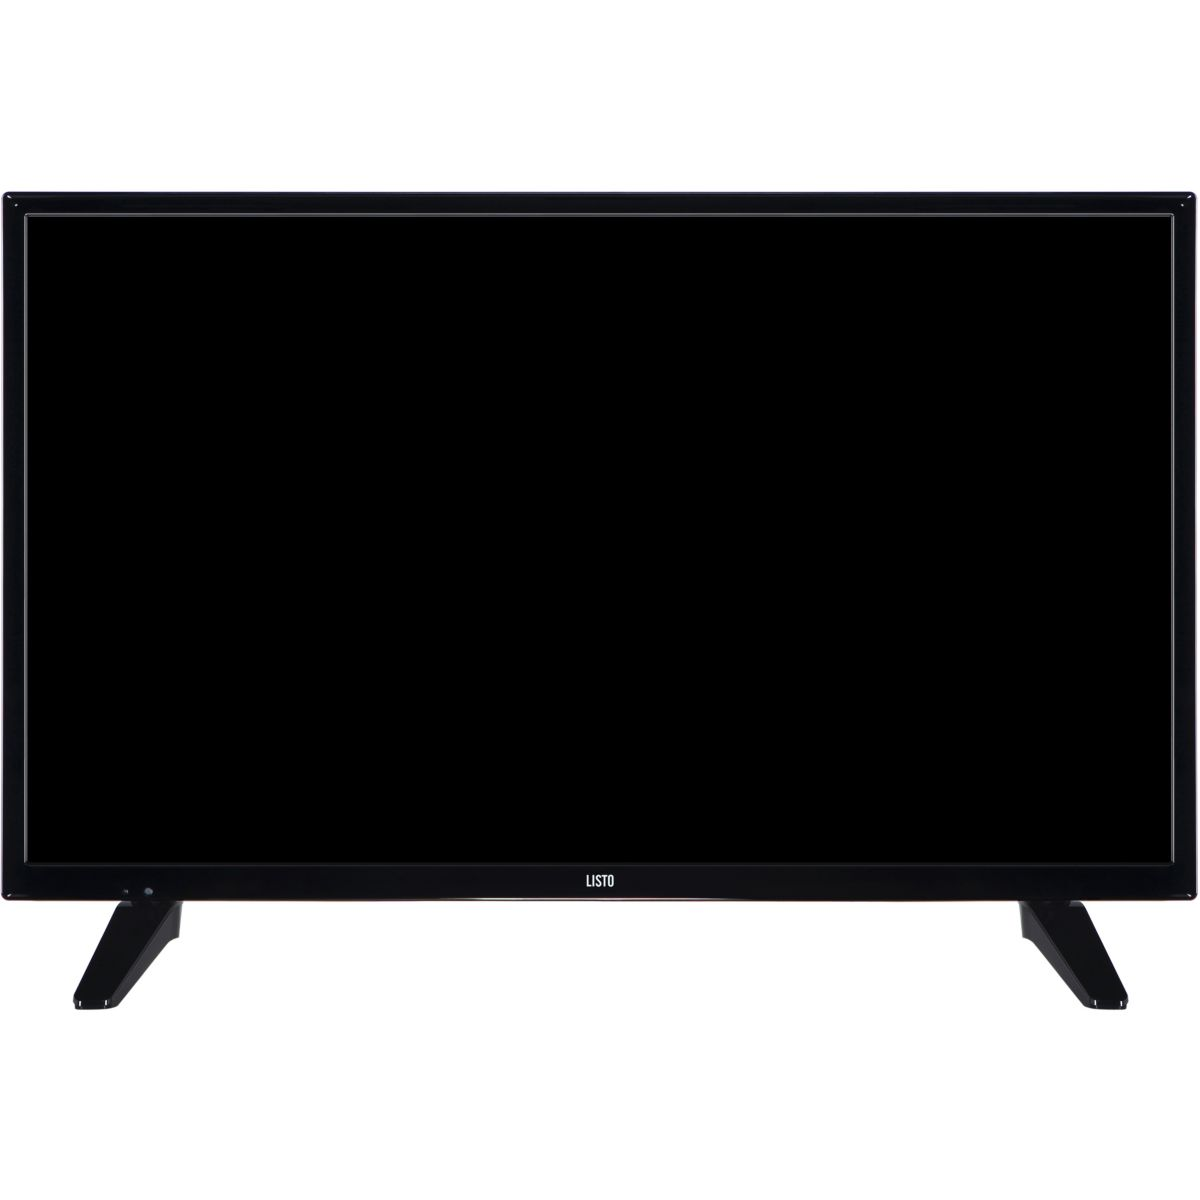 TV LISTO 32 HD-2T-127